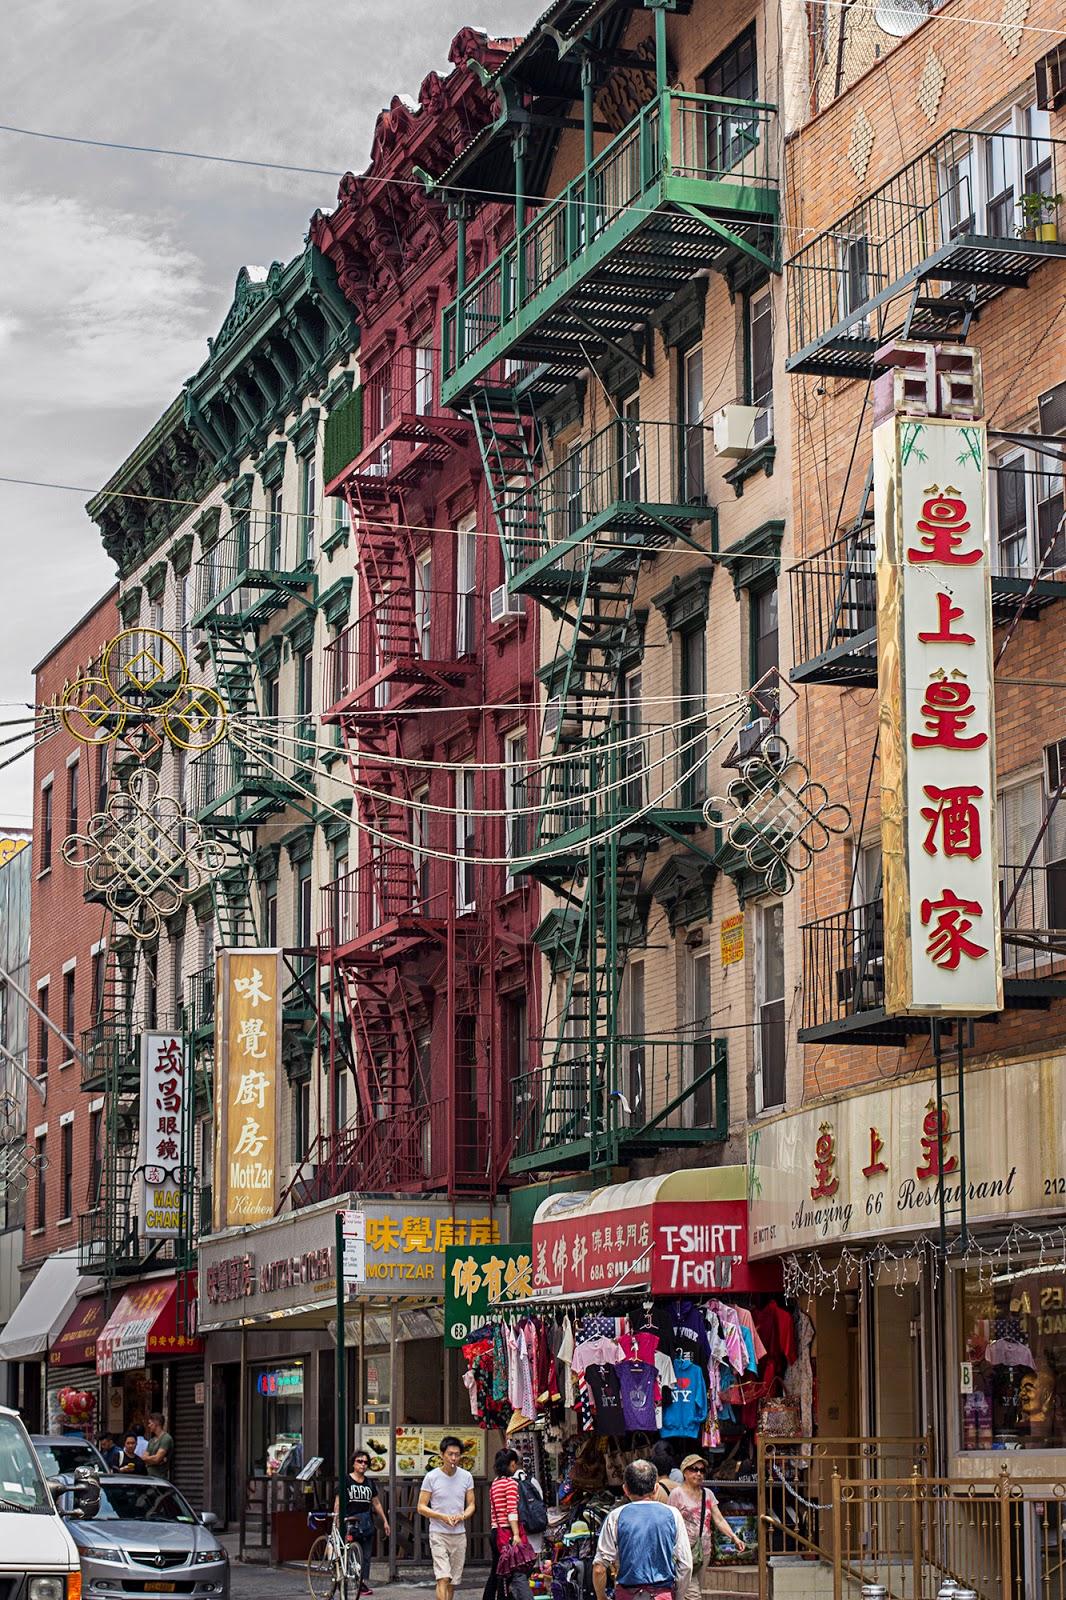 Chinatown Nueva York